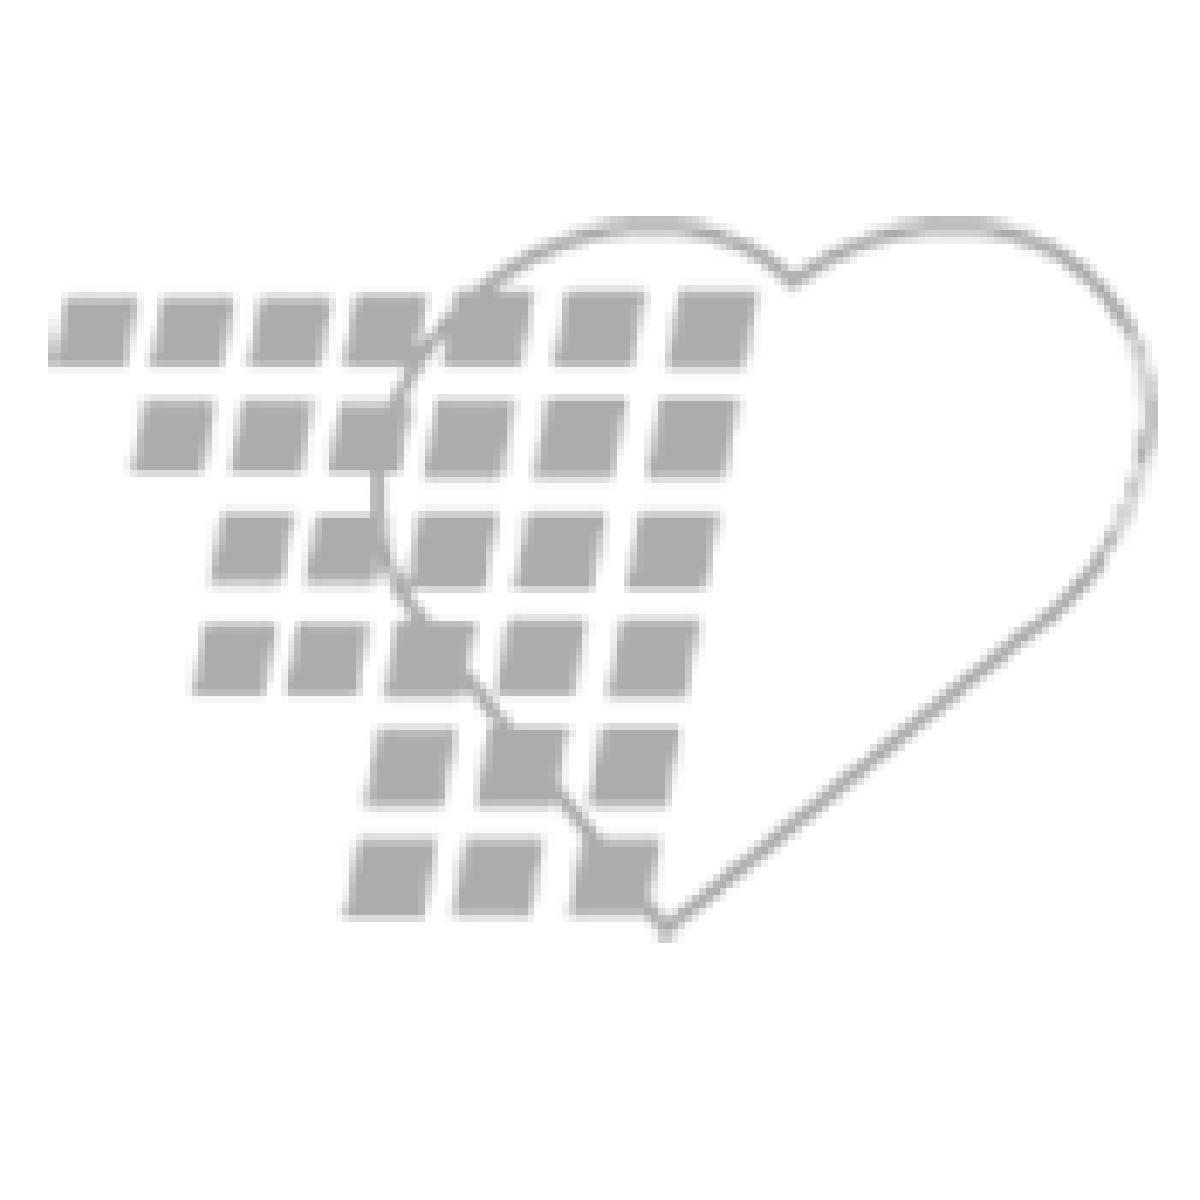 06-93-0424 Demo Dose® 10% Amino IV Fluid 1000 mL